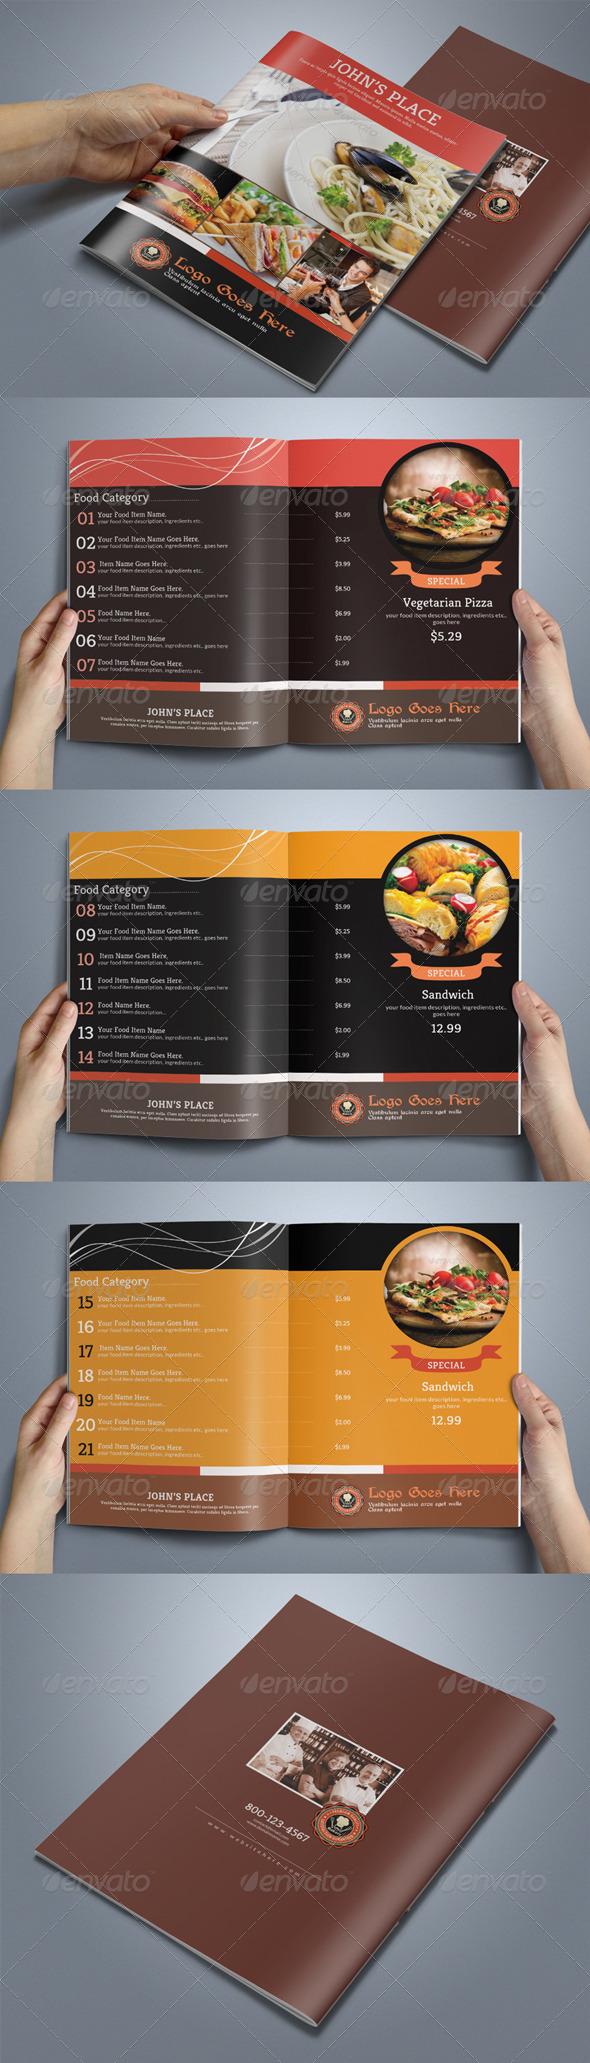 8 Pages Food Menu - Food Menus Print Templates